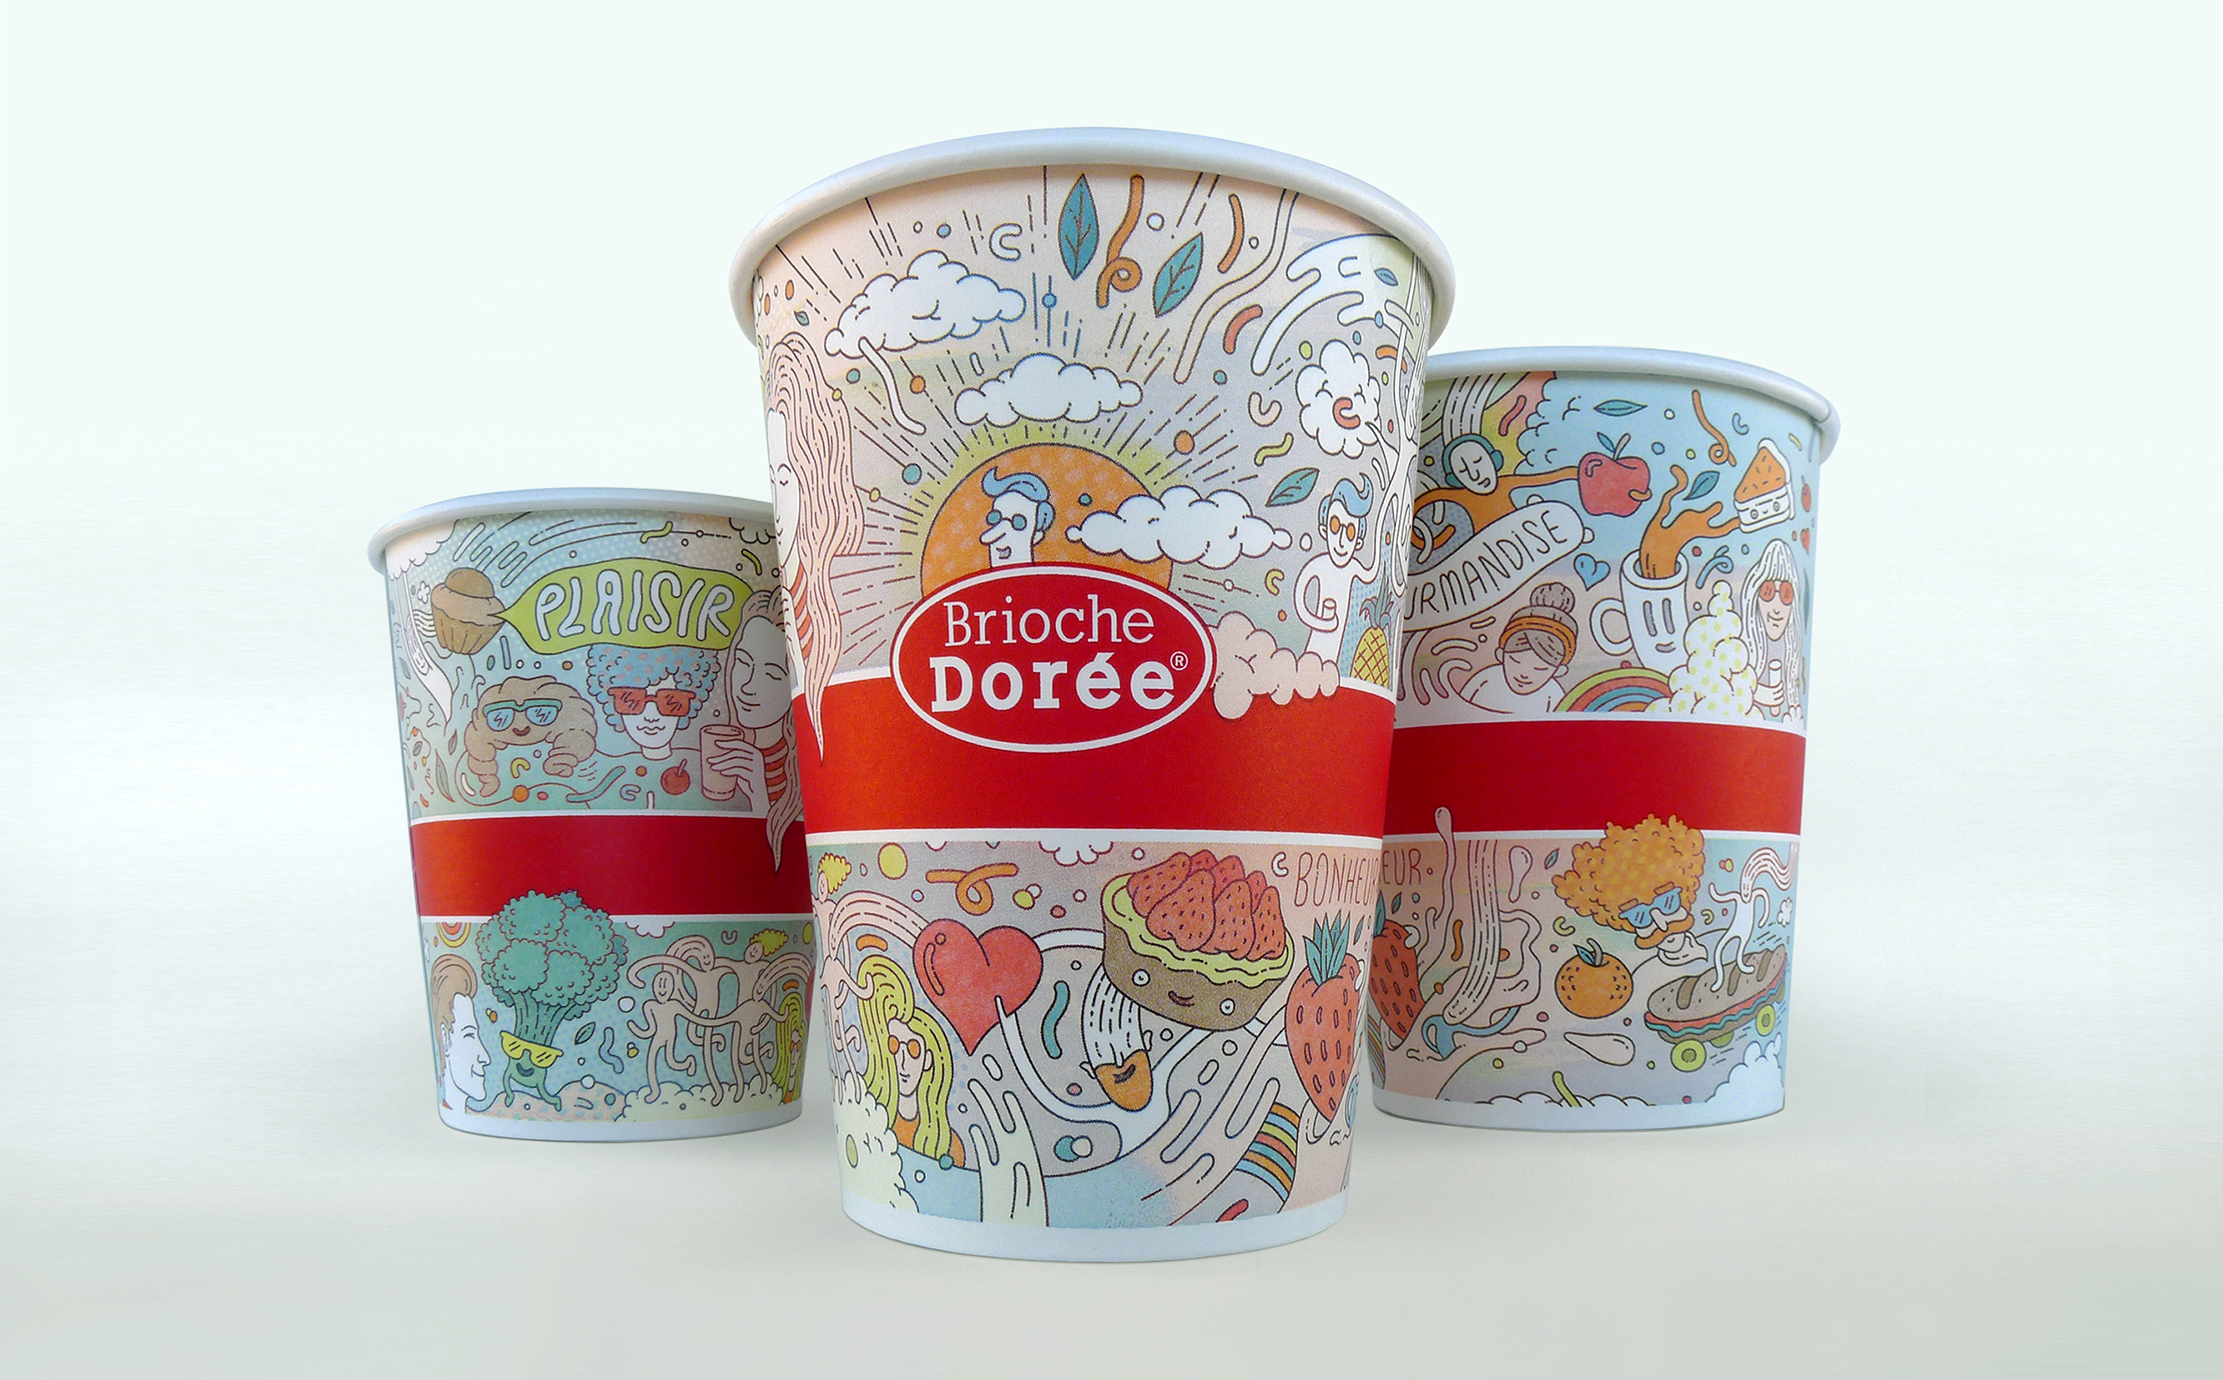 Brioche Doree Packaging Illustration